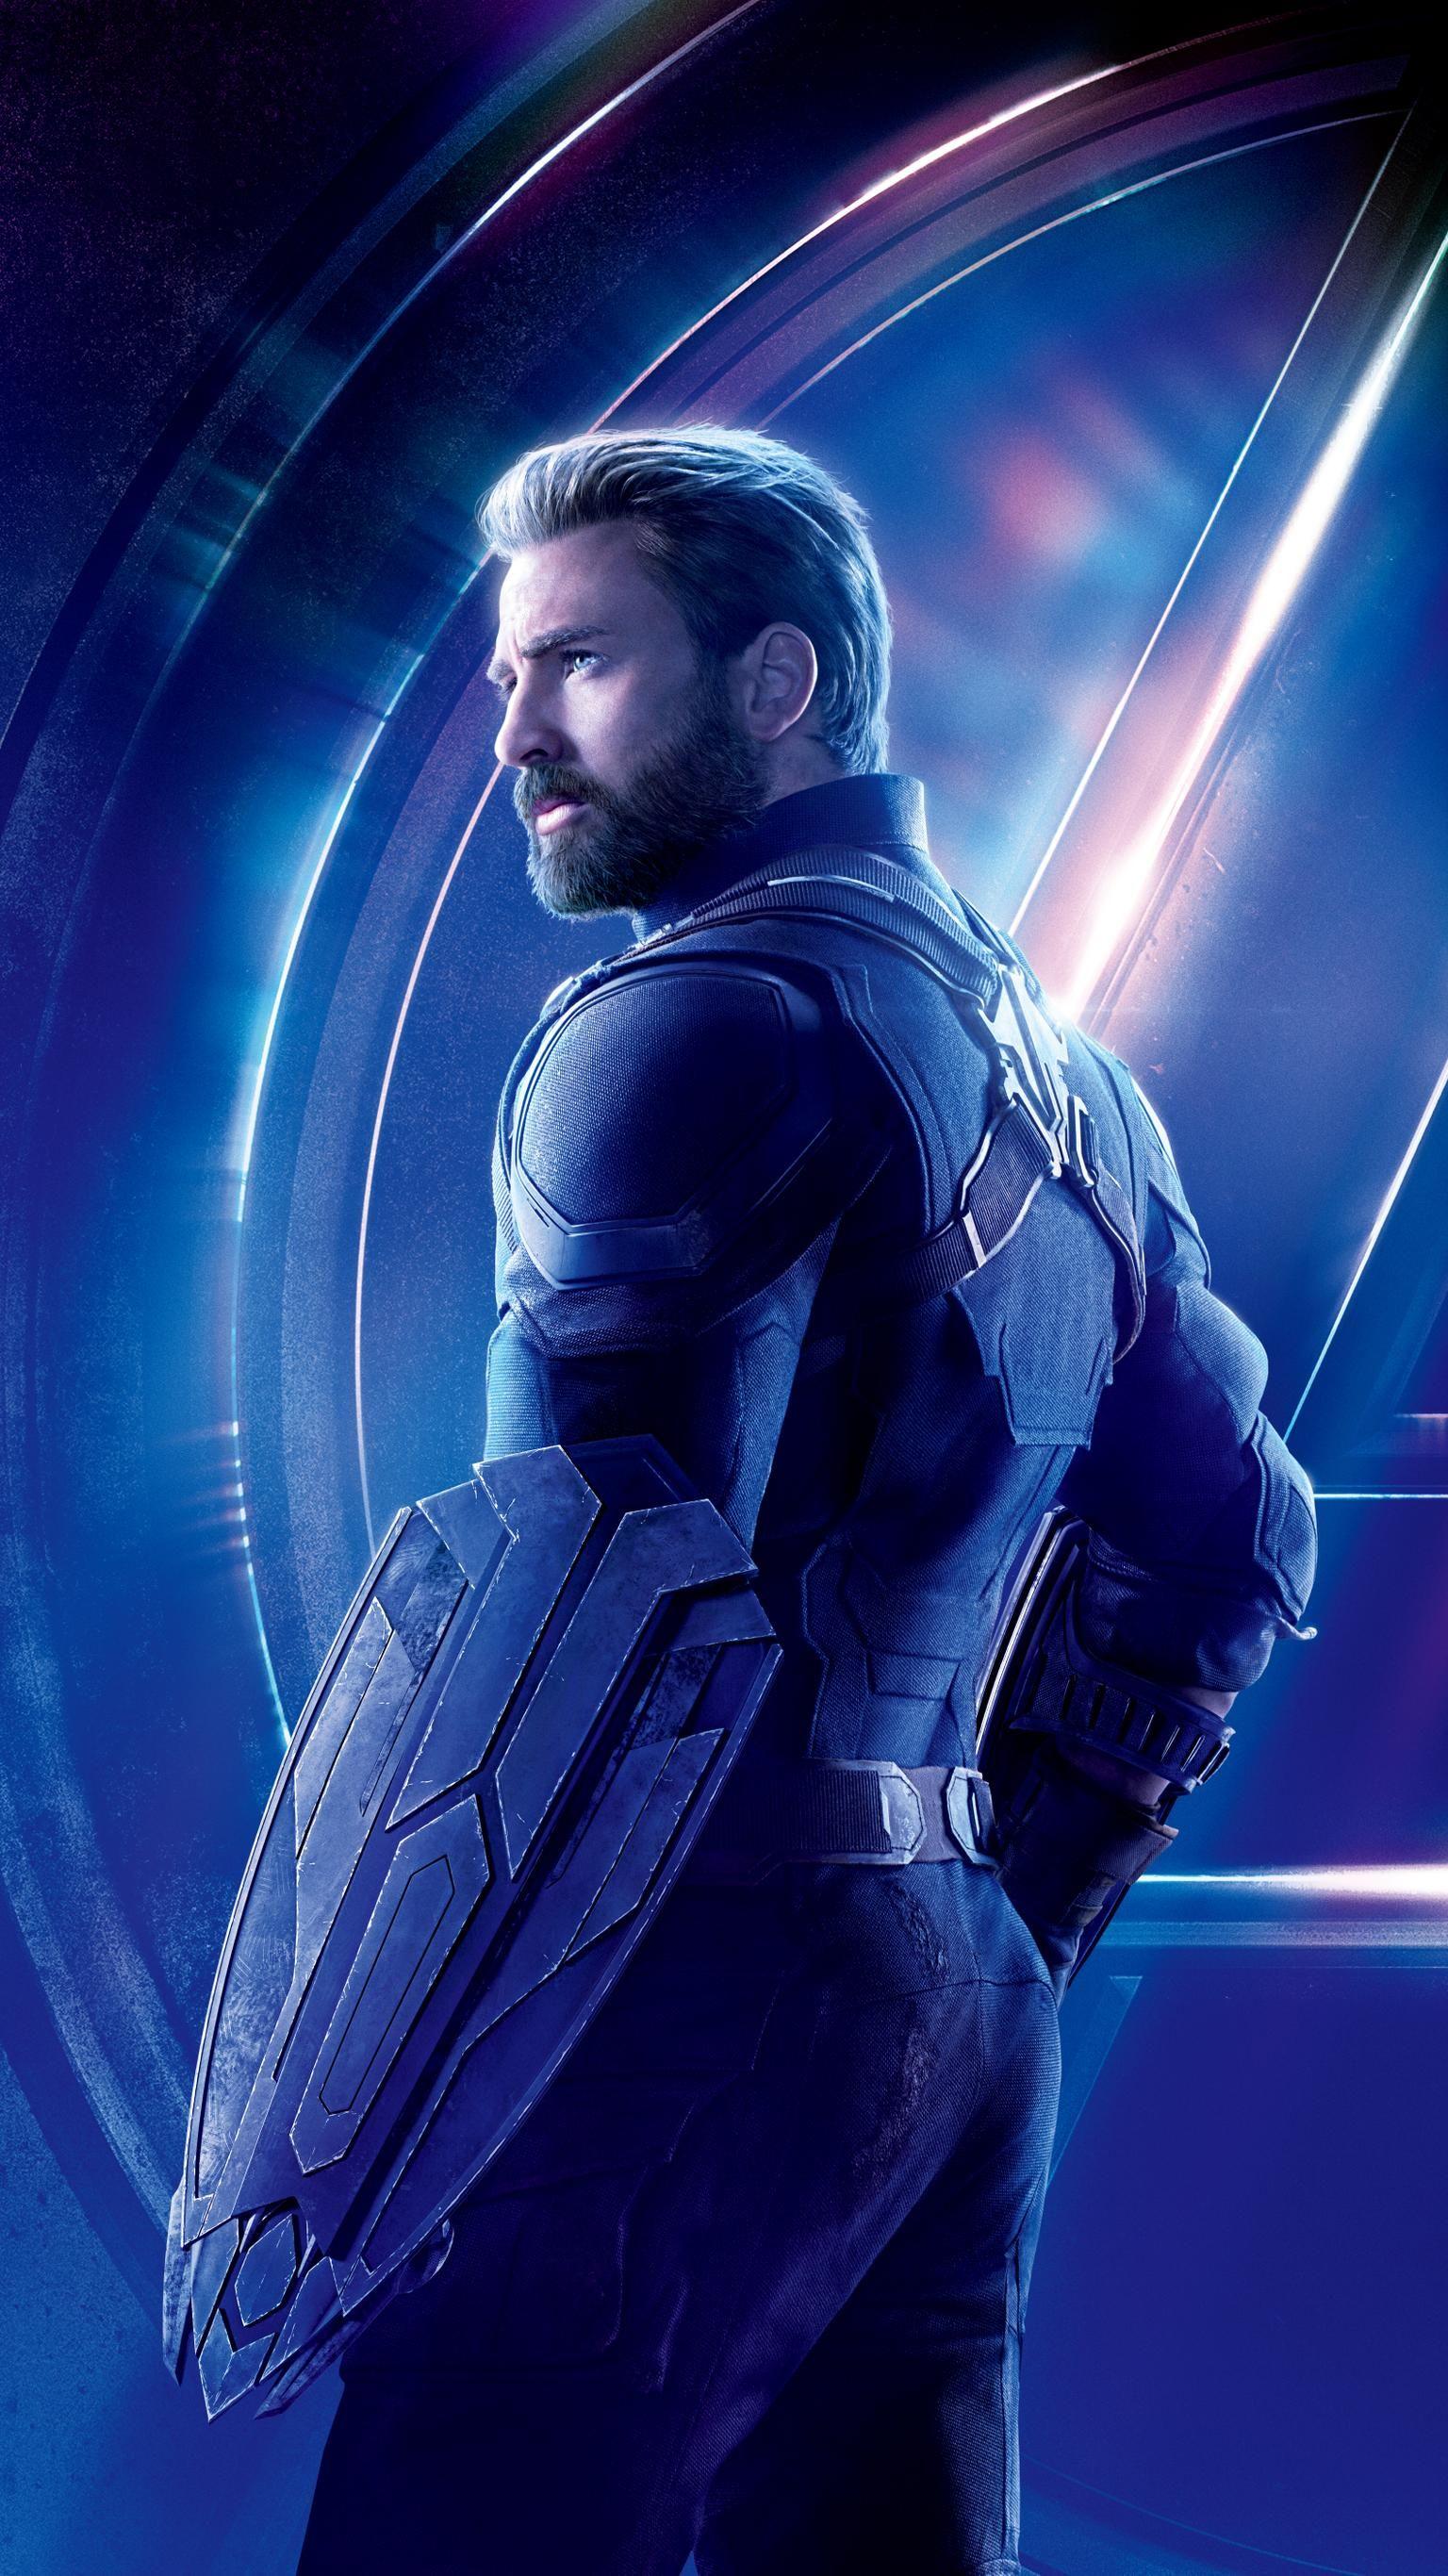 Avengers Infinity War 2018 Phone Wallpaper Moviemania Marvel Avengers Marvel Characters Captain America Poster